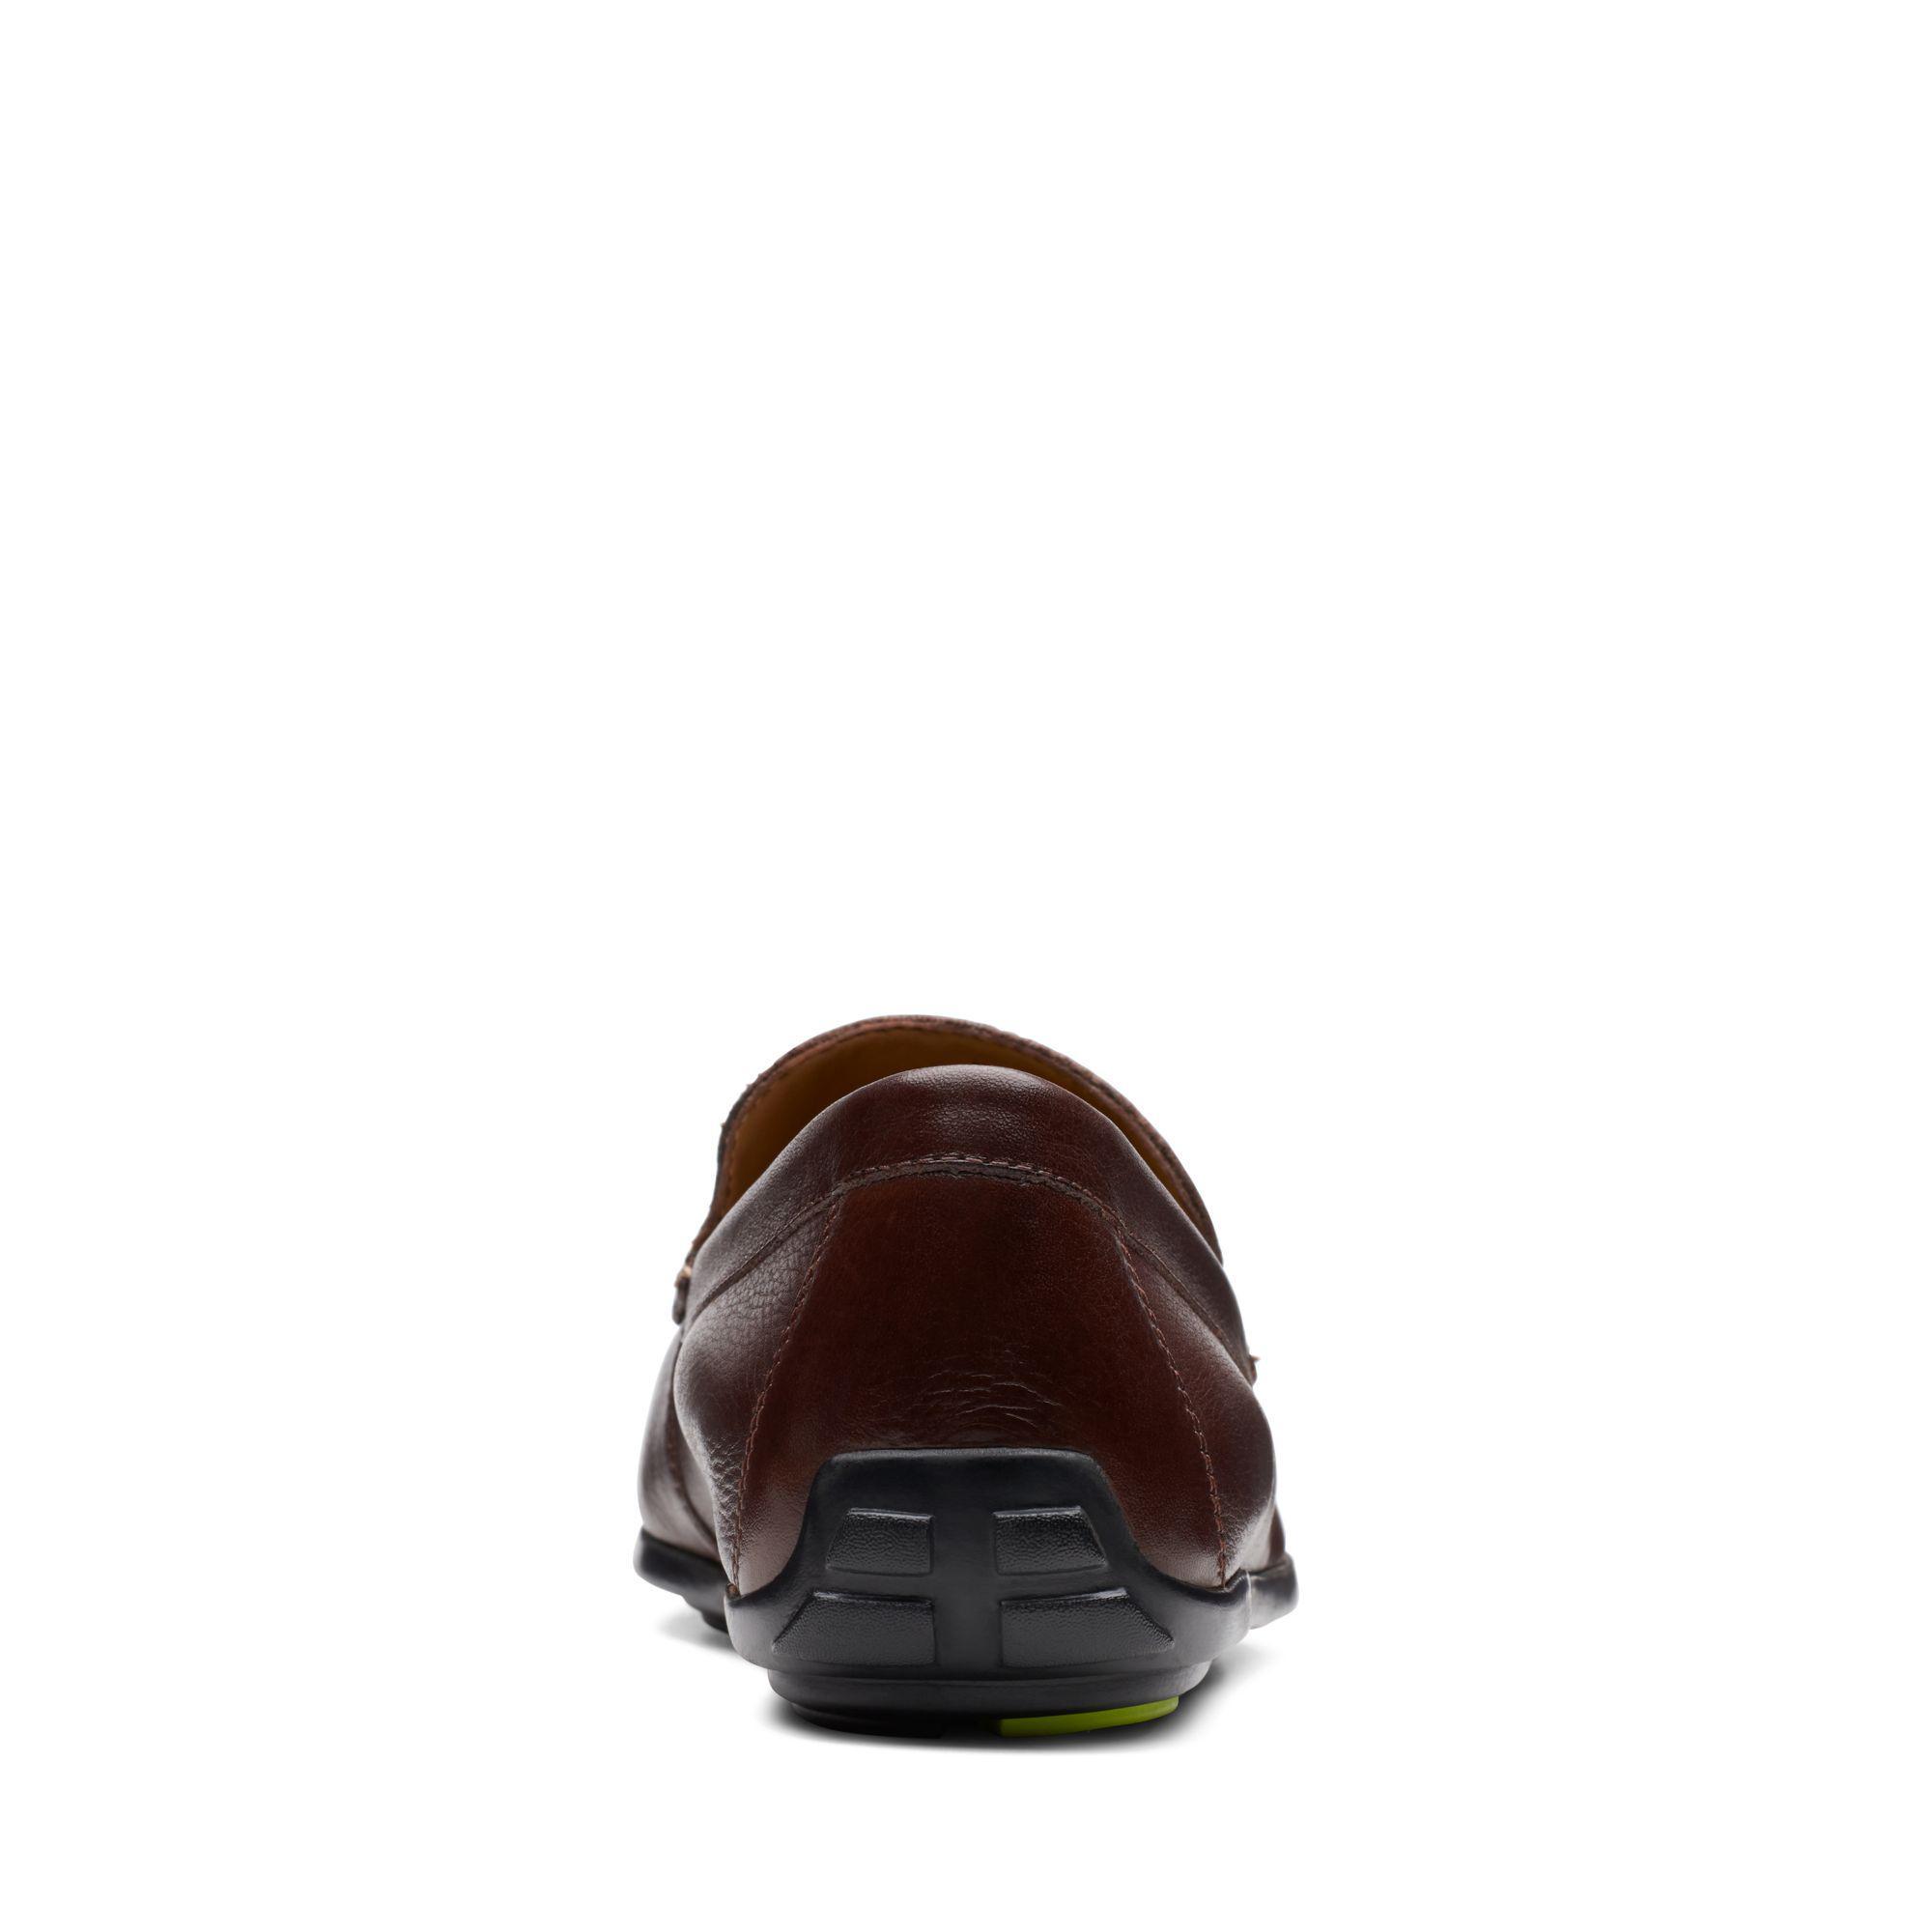 Clarks Leather Grafton Loafer in Dark